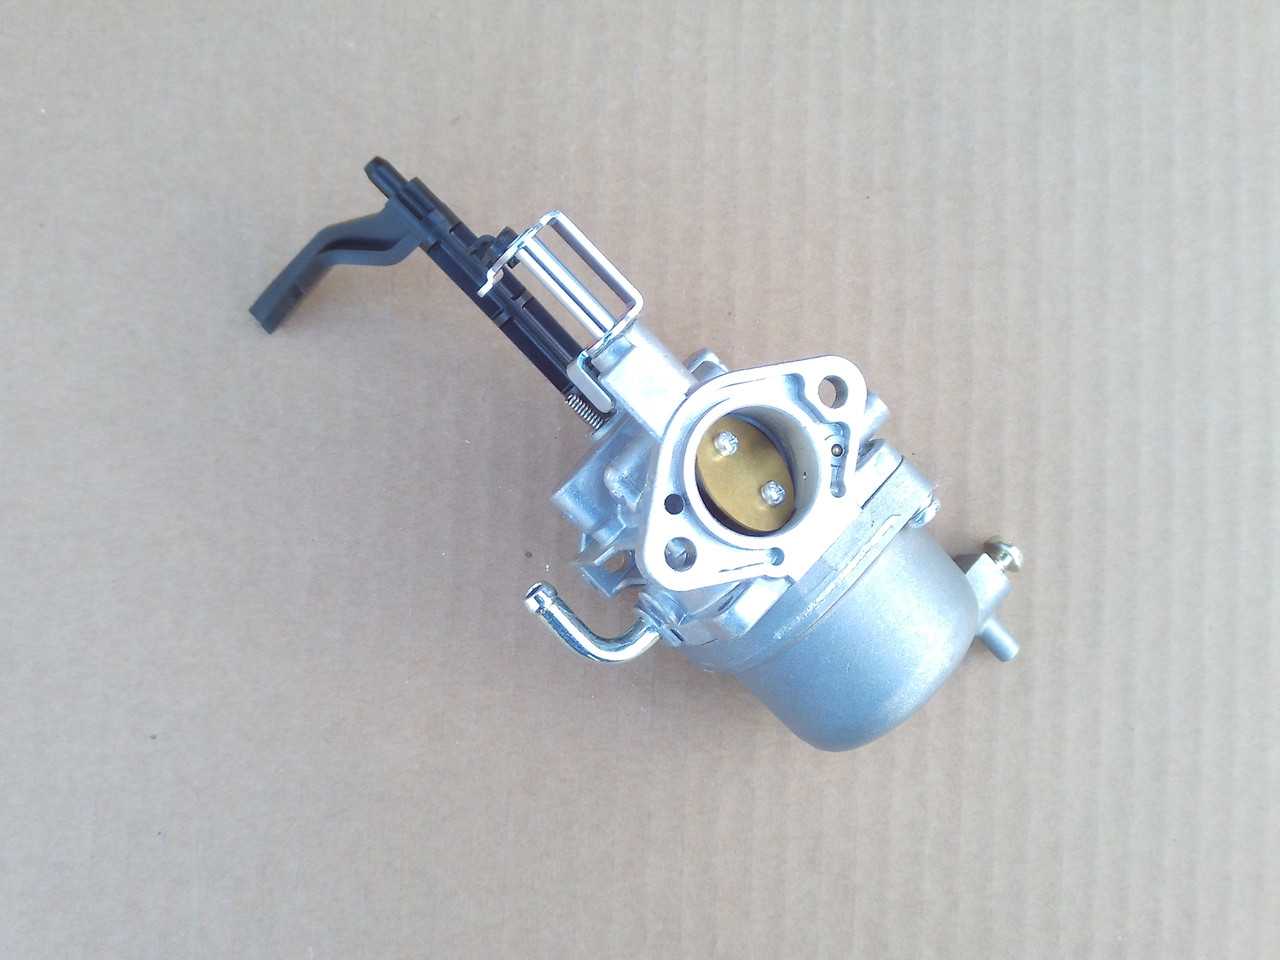 Carburetor Fits For Robin Subaru 20B-62302-30 20B-62302-20 Specific EX40